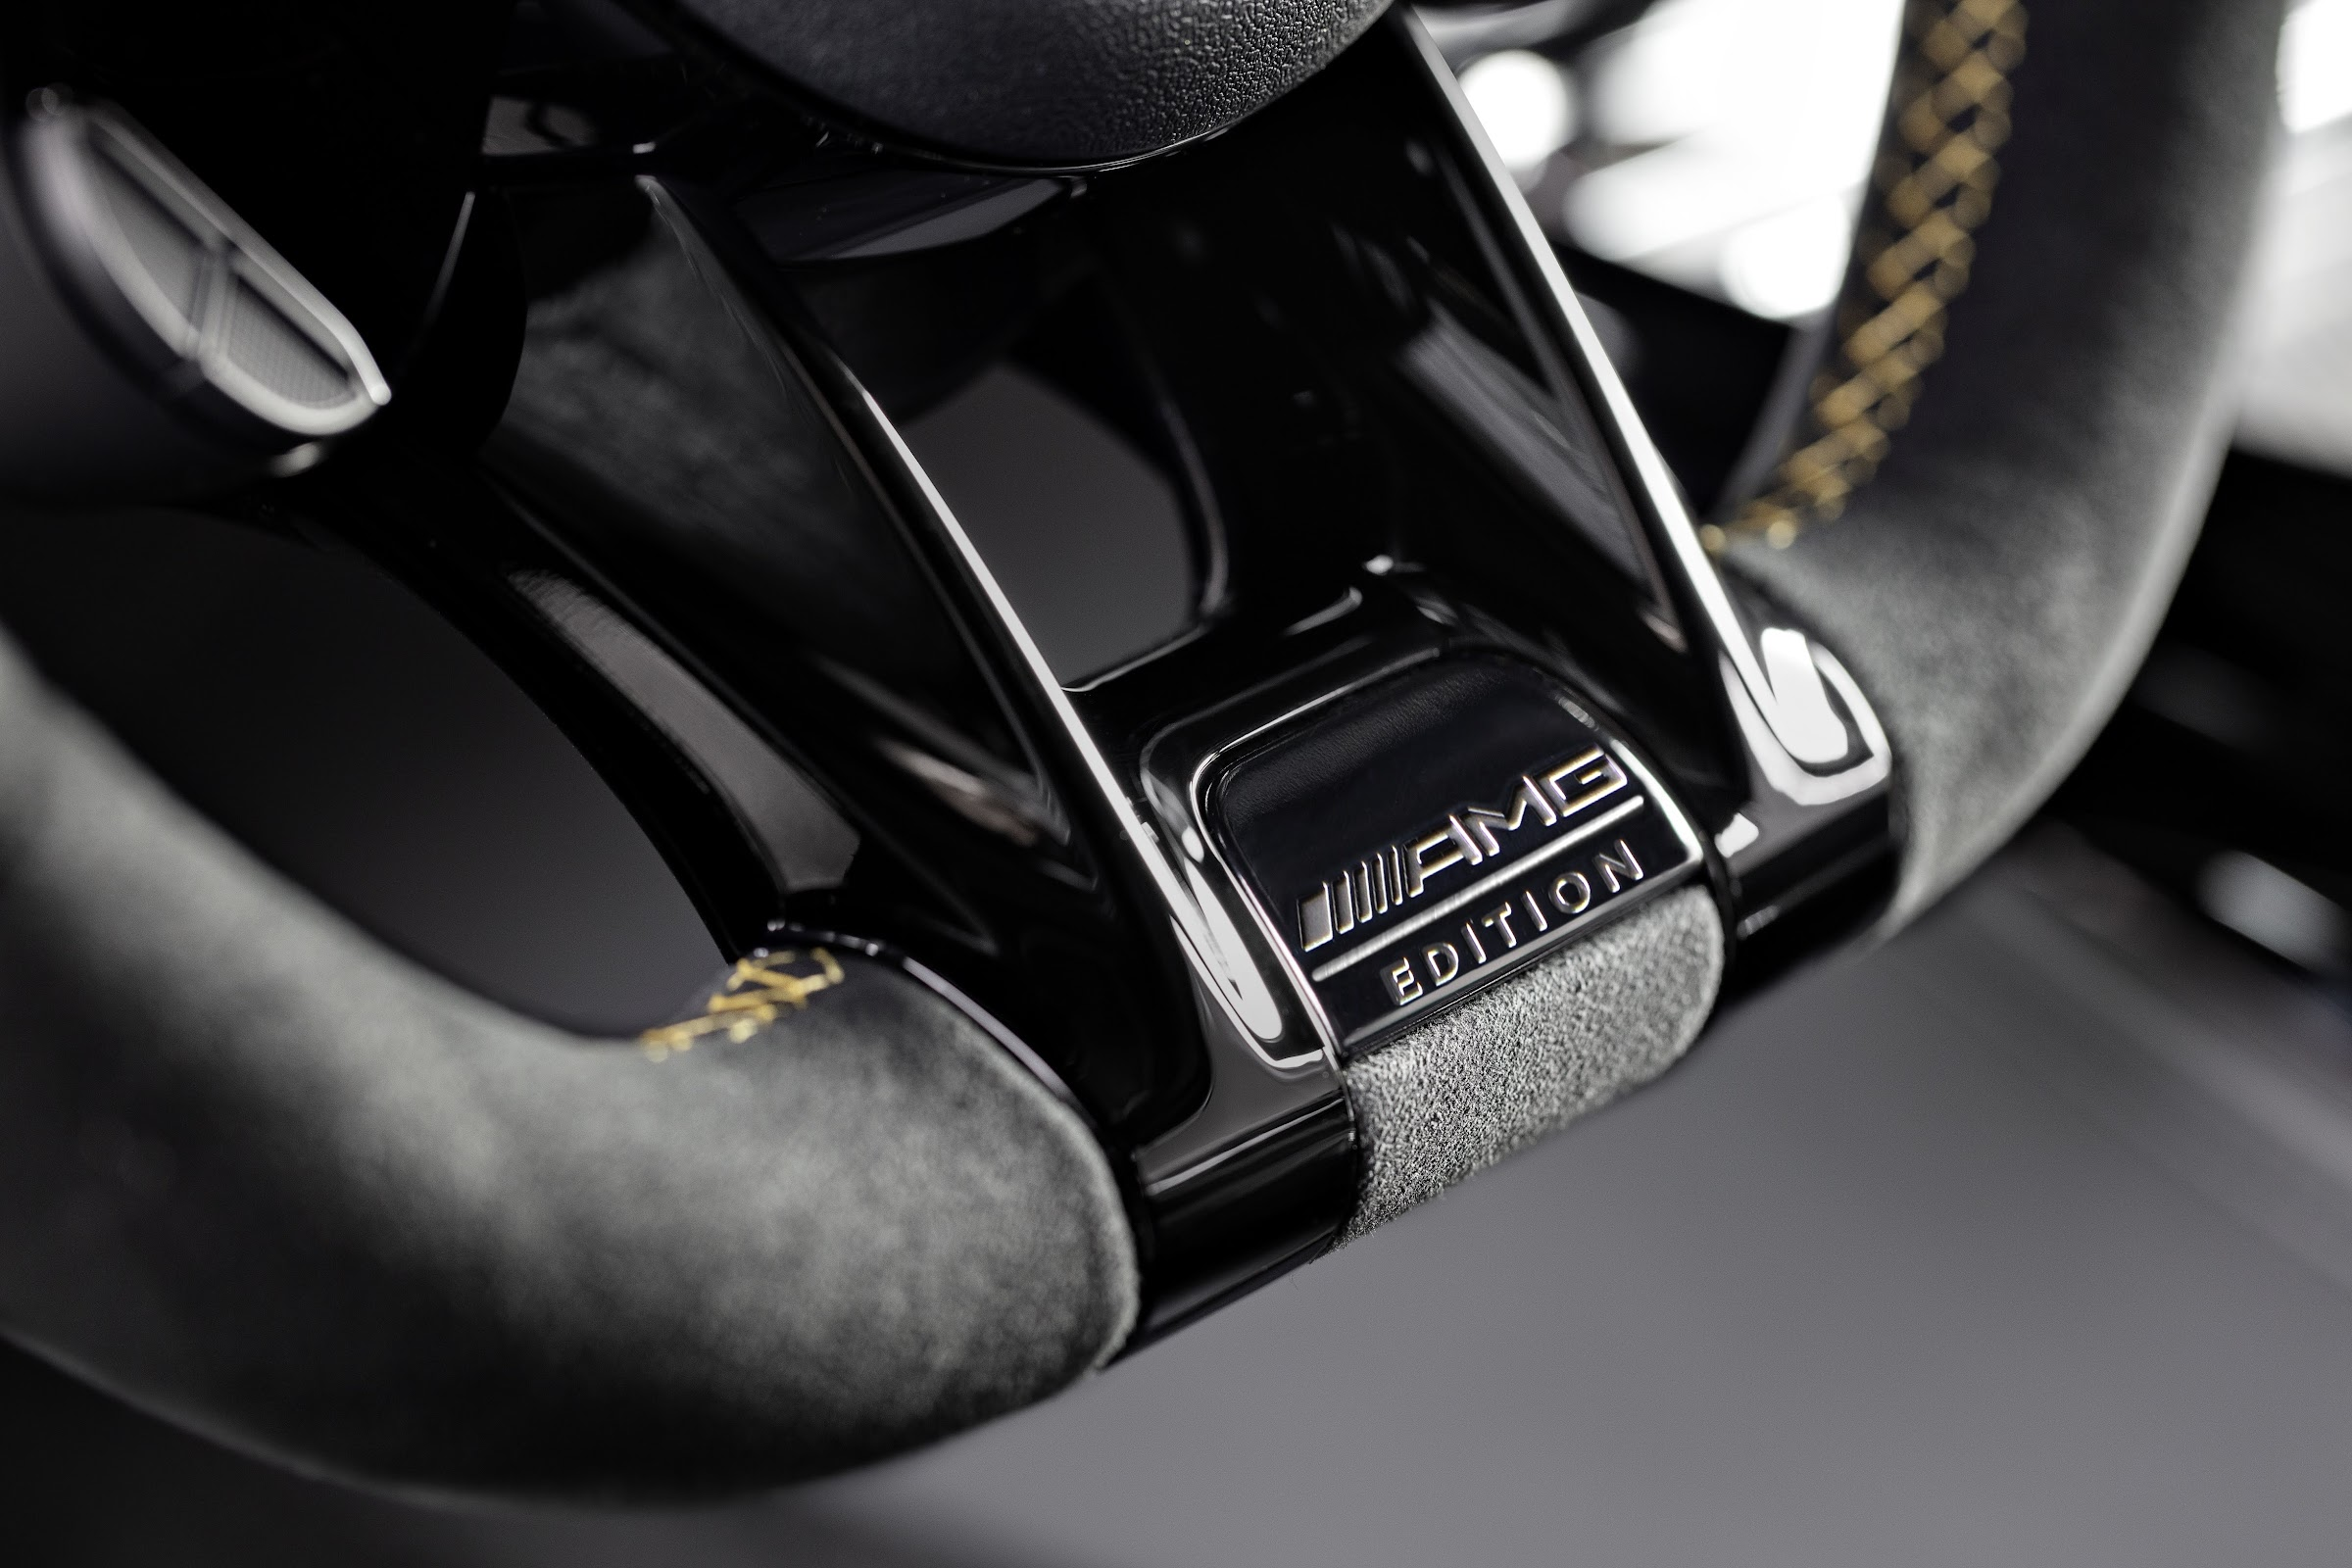 graJ8LJC6kHZS RJ QvSxvDRfa49H5sjQriWYhE7wibB hNWn0OoiKvrxoHqzHMdKARzm3gaOzCTk9I6QsqLcYl9ohpECICY8Mea65Gm0KyRVwj 9570gRIKJ7HMAJtCt4BbqiSr1A=w2400 - Mercedes-AMG GT 4-puertas Coupé Edition 1